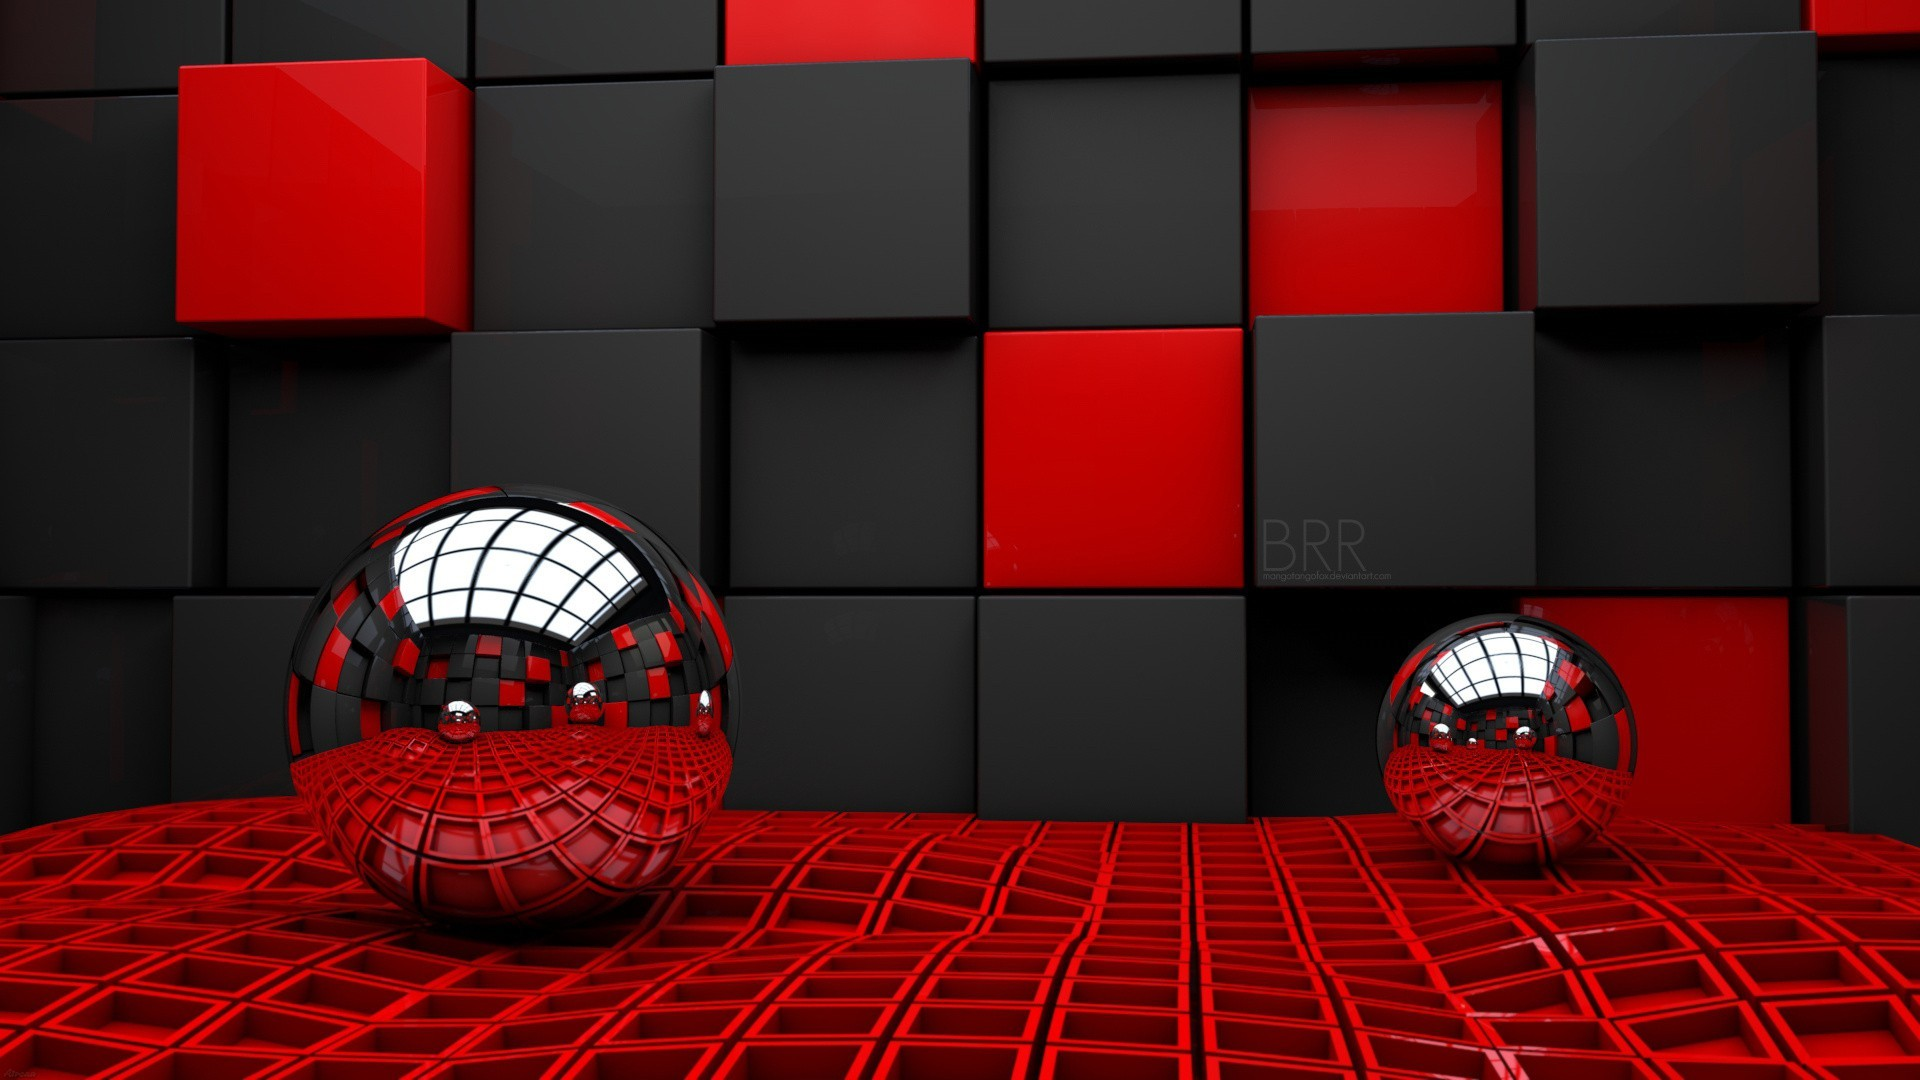 Abstract – 3D CGI Digital Abstract Black Red Metal Ball Wallpaper